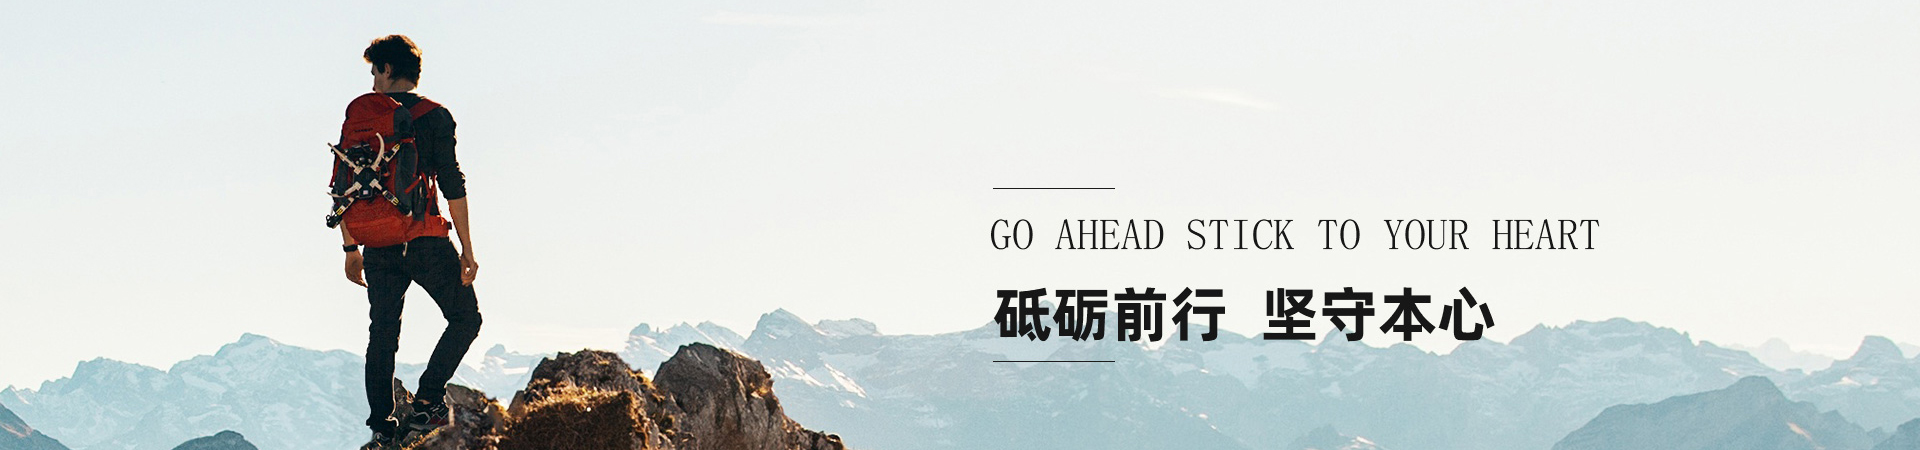 http://www.ycshengfeng.cn/data/upload/202003/20200324154623_794.jpg